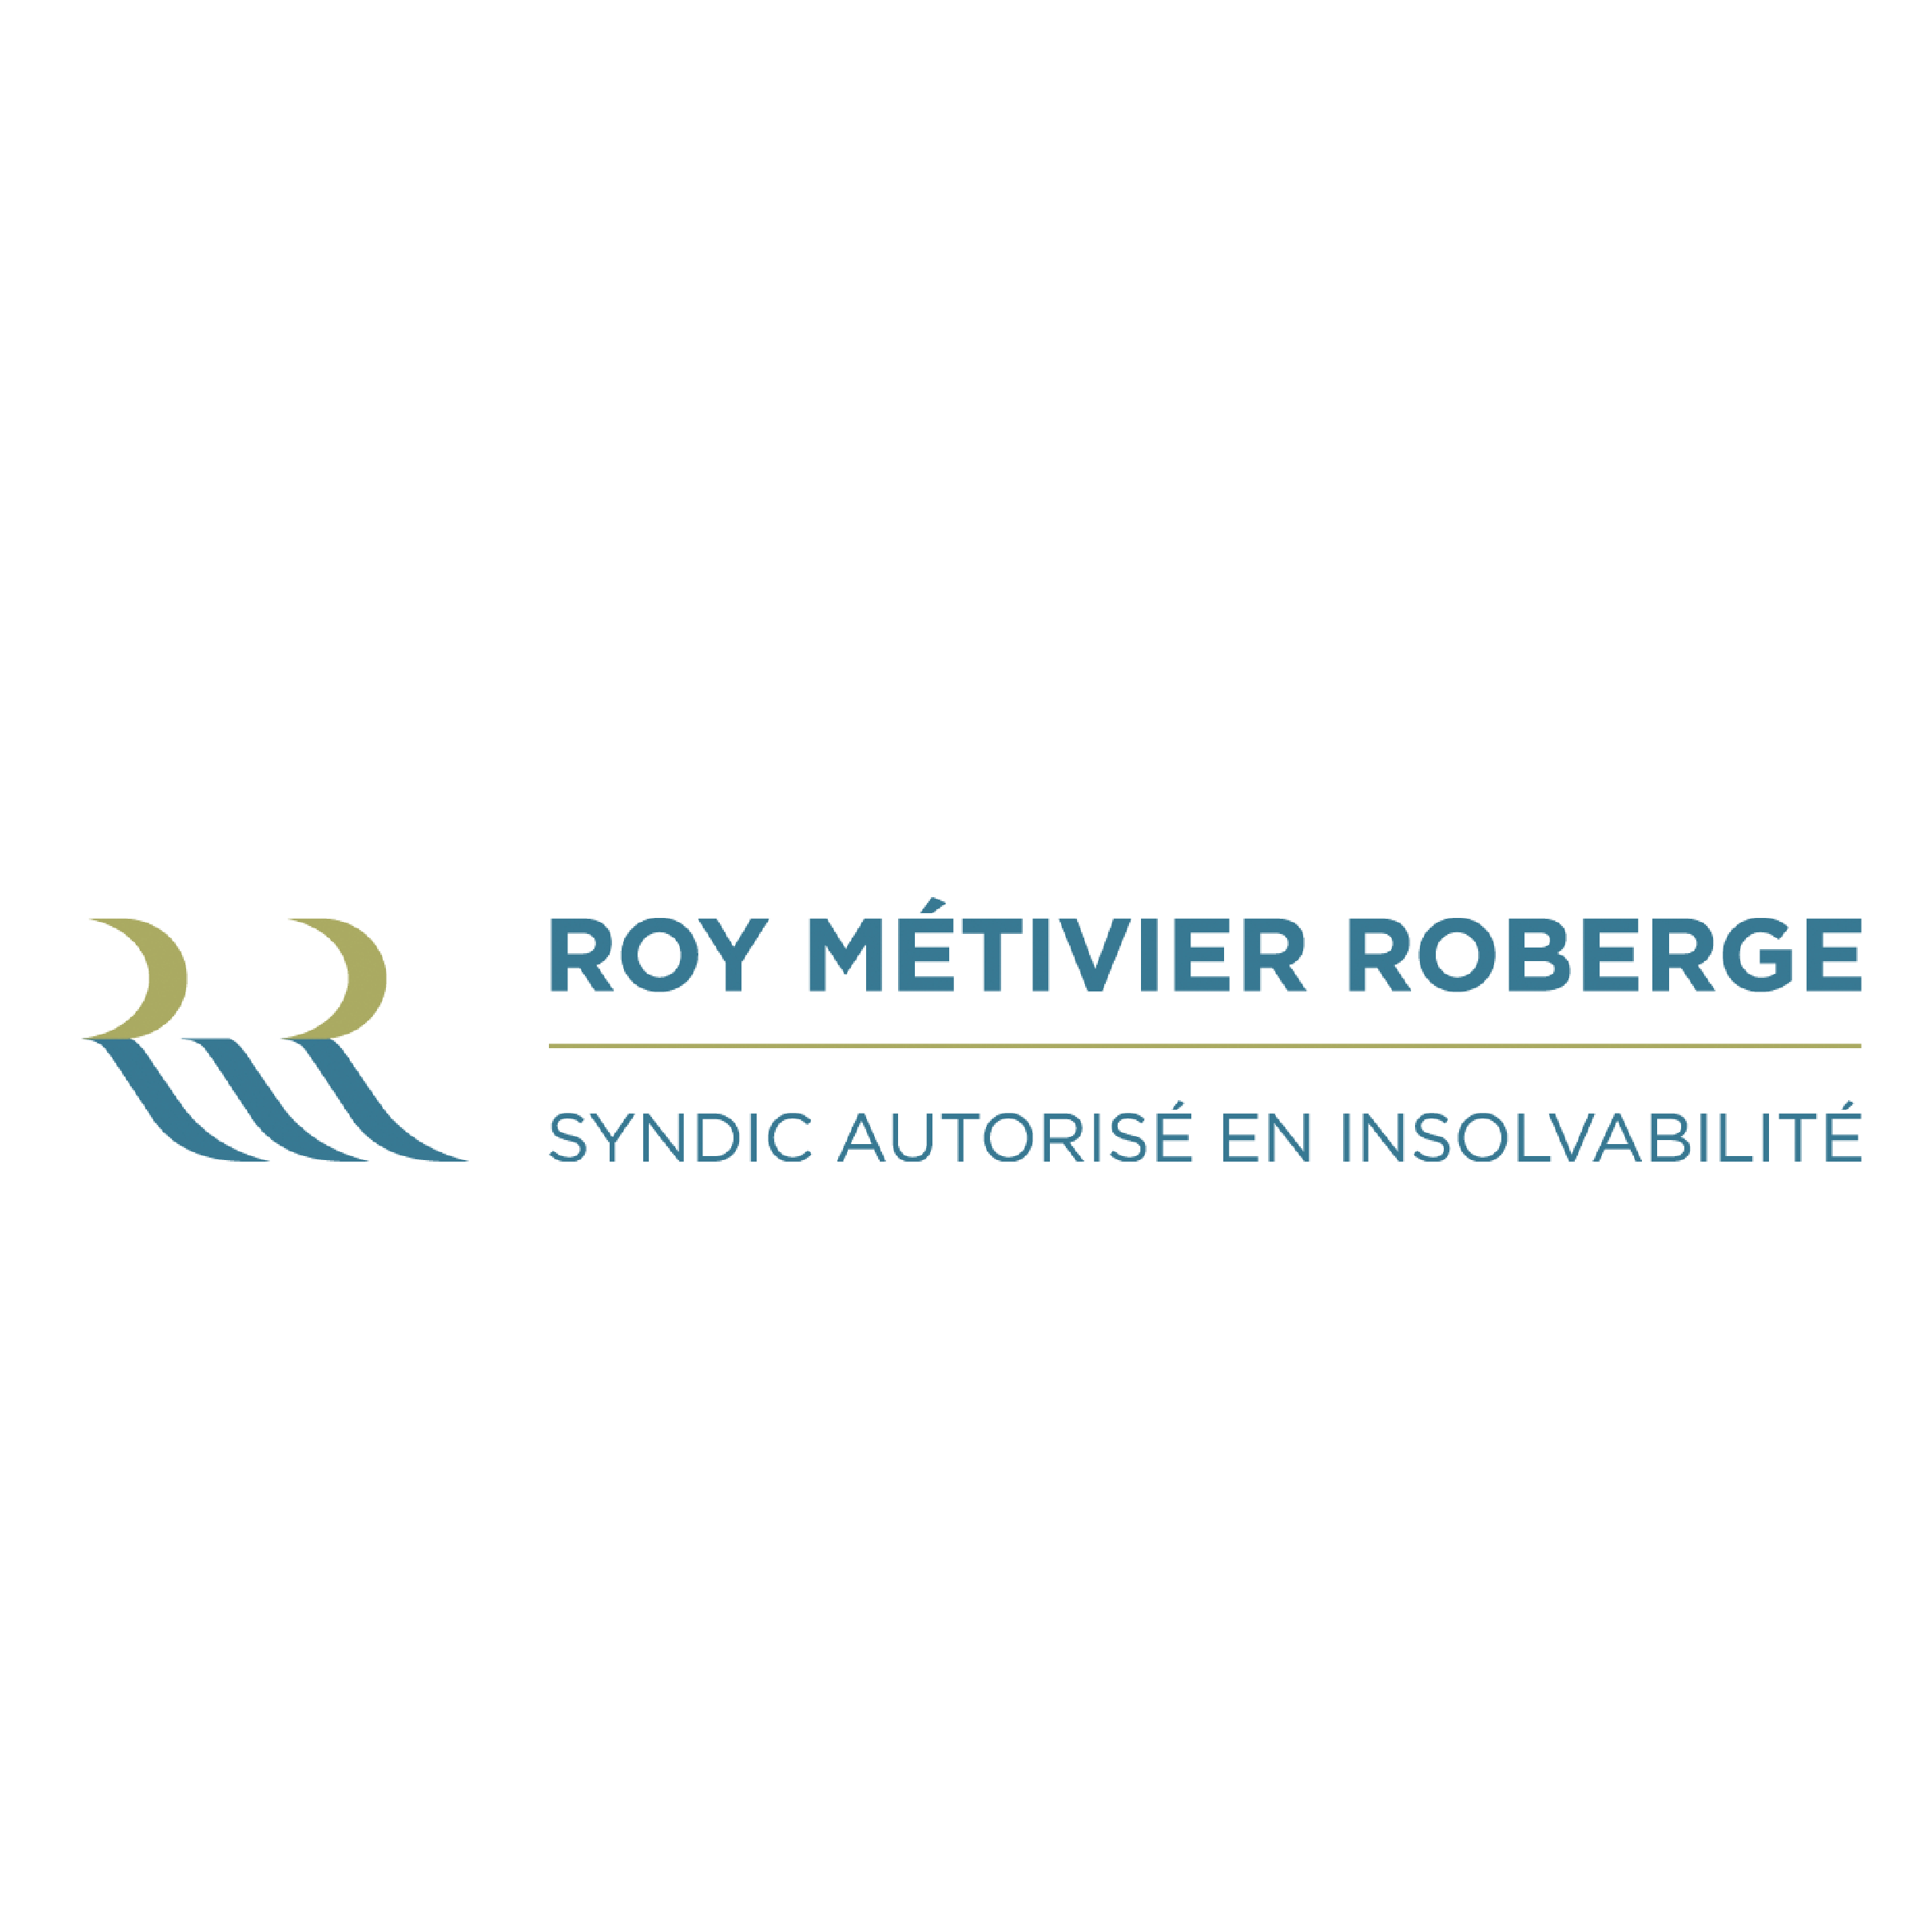 Roy Métivier Roberge